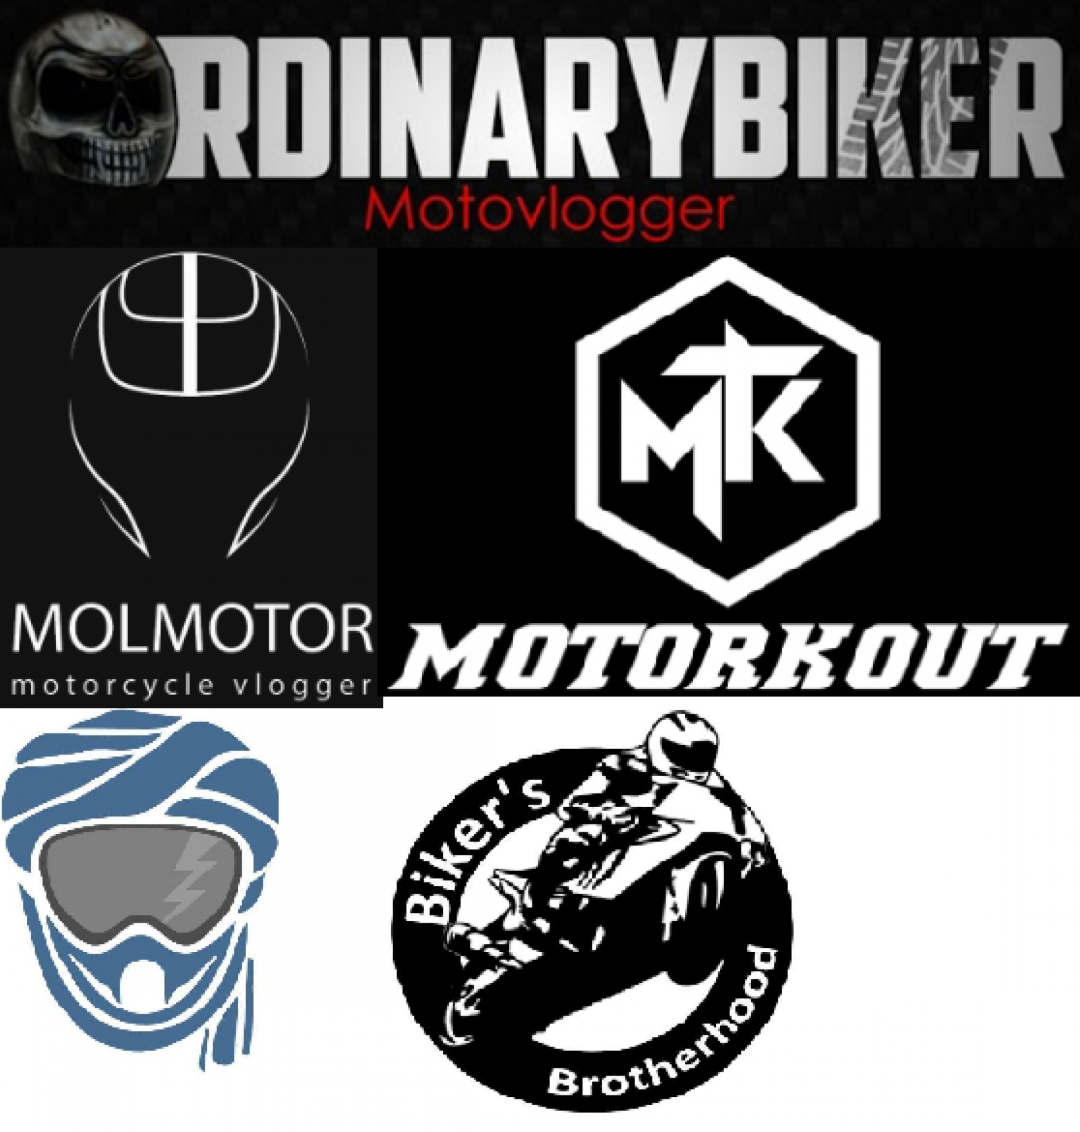 Les motovloggers marocains